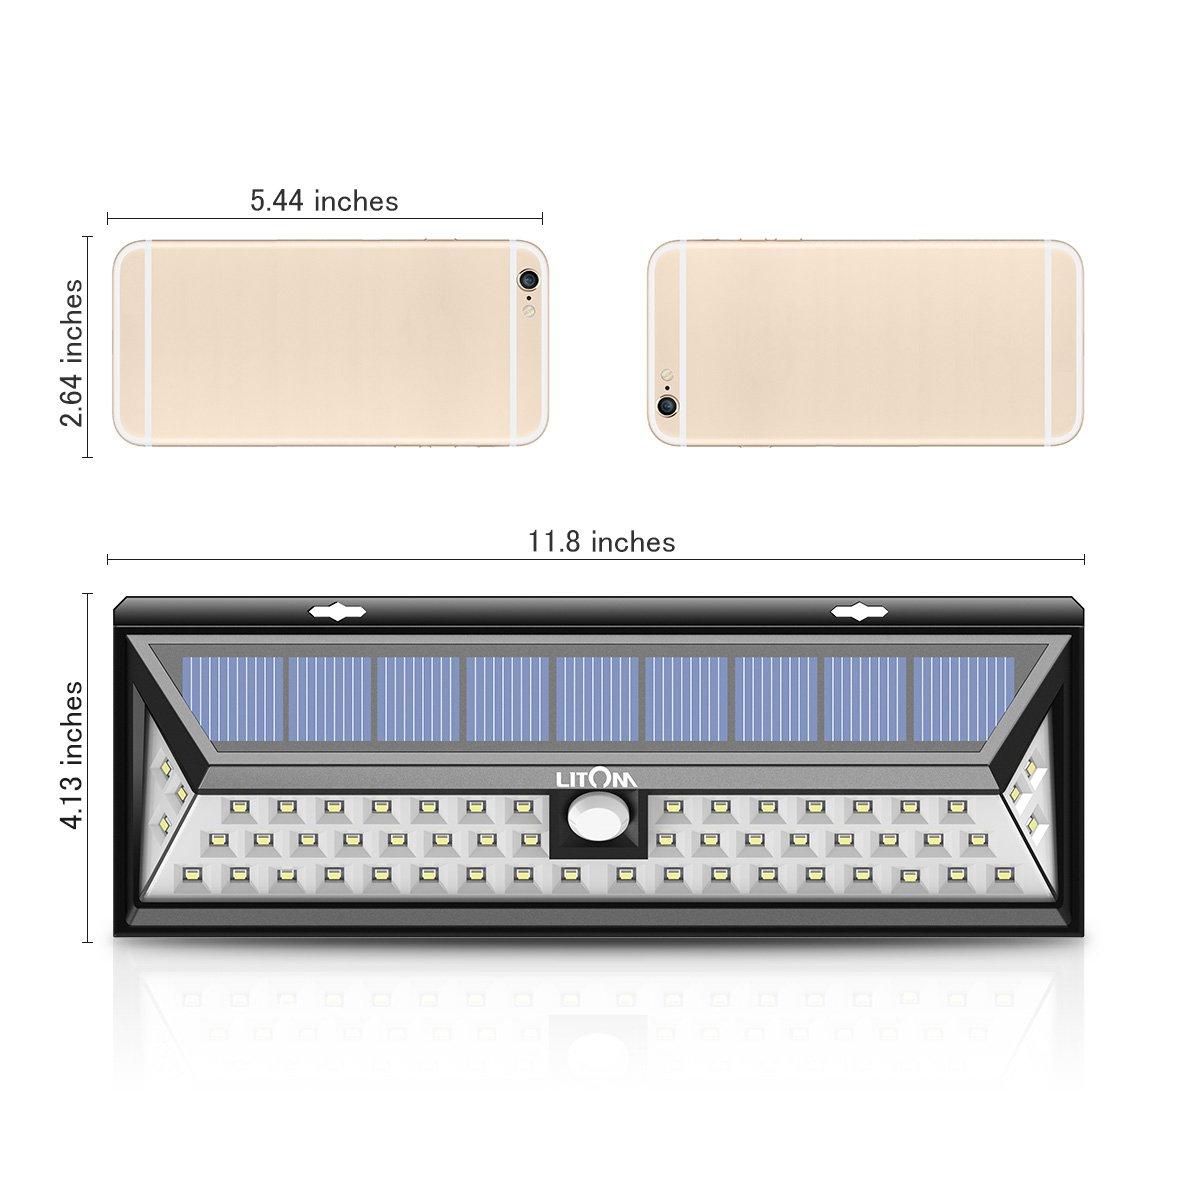 Litom Super Bright Solar Lights 54 LED Solar Power Outdoor Motion Sensor Light With LED on Both Side by Litom (Image #7)